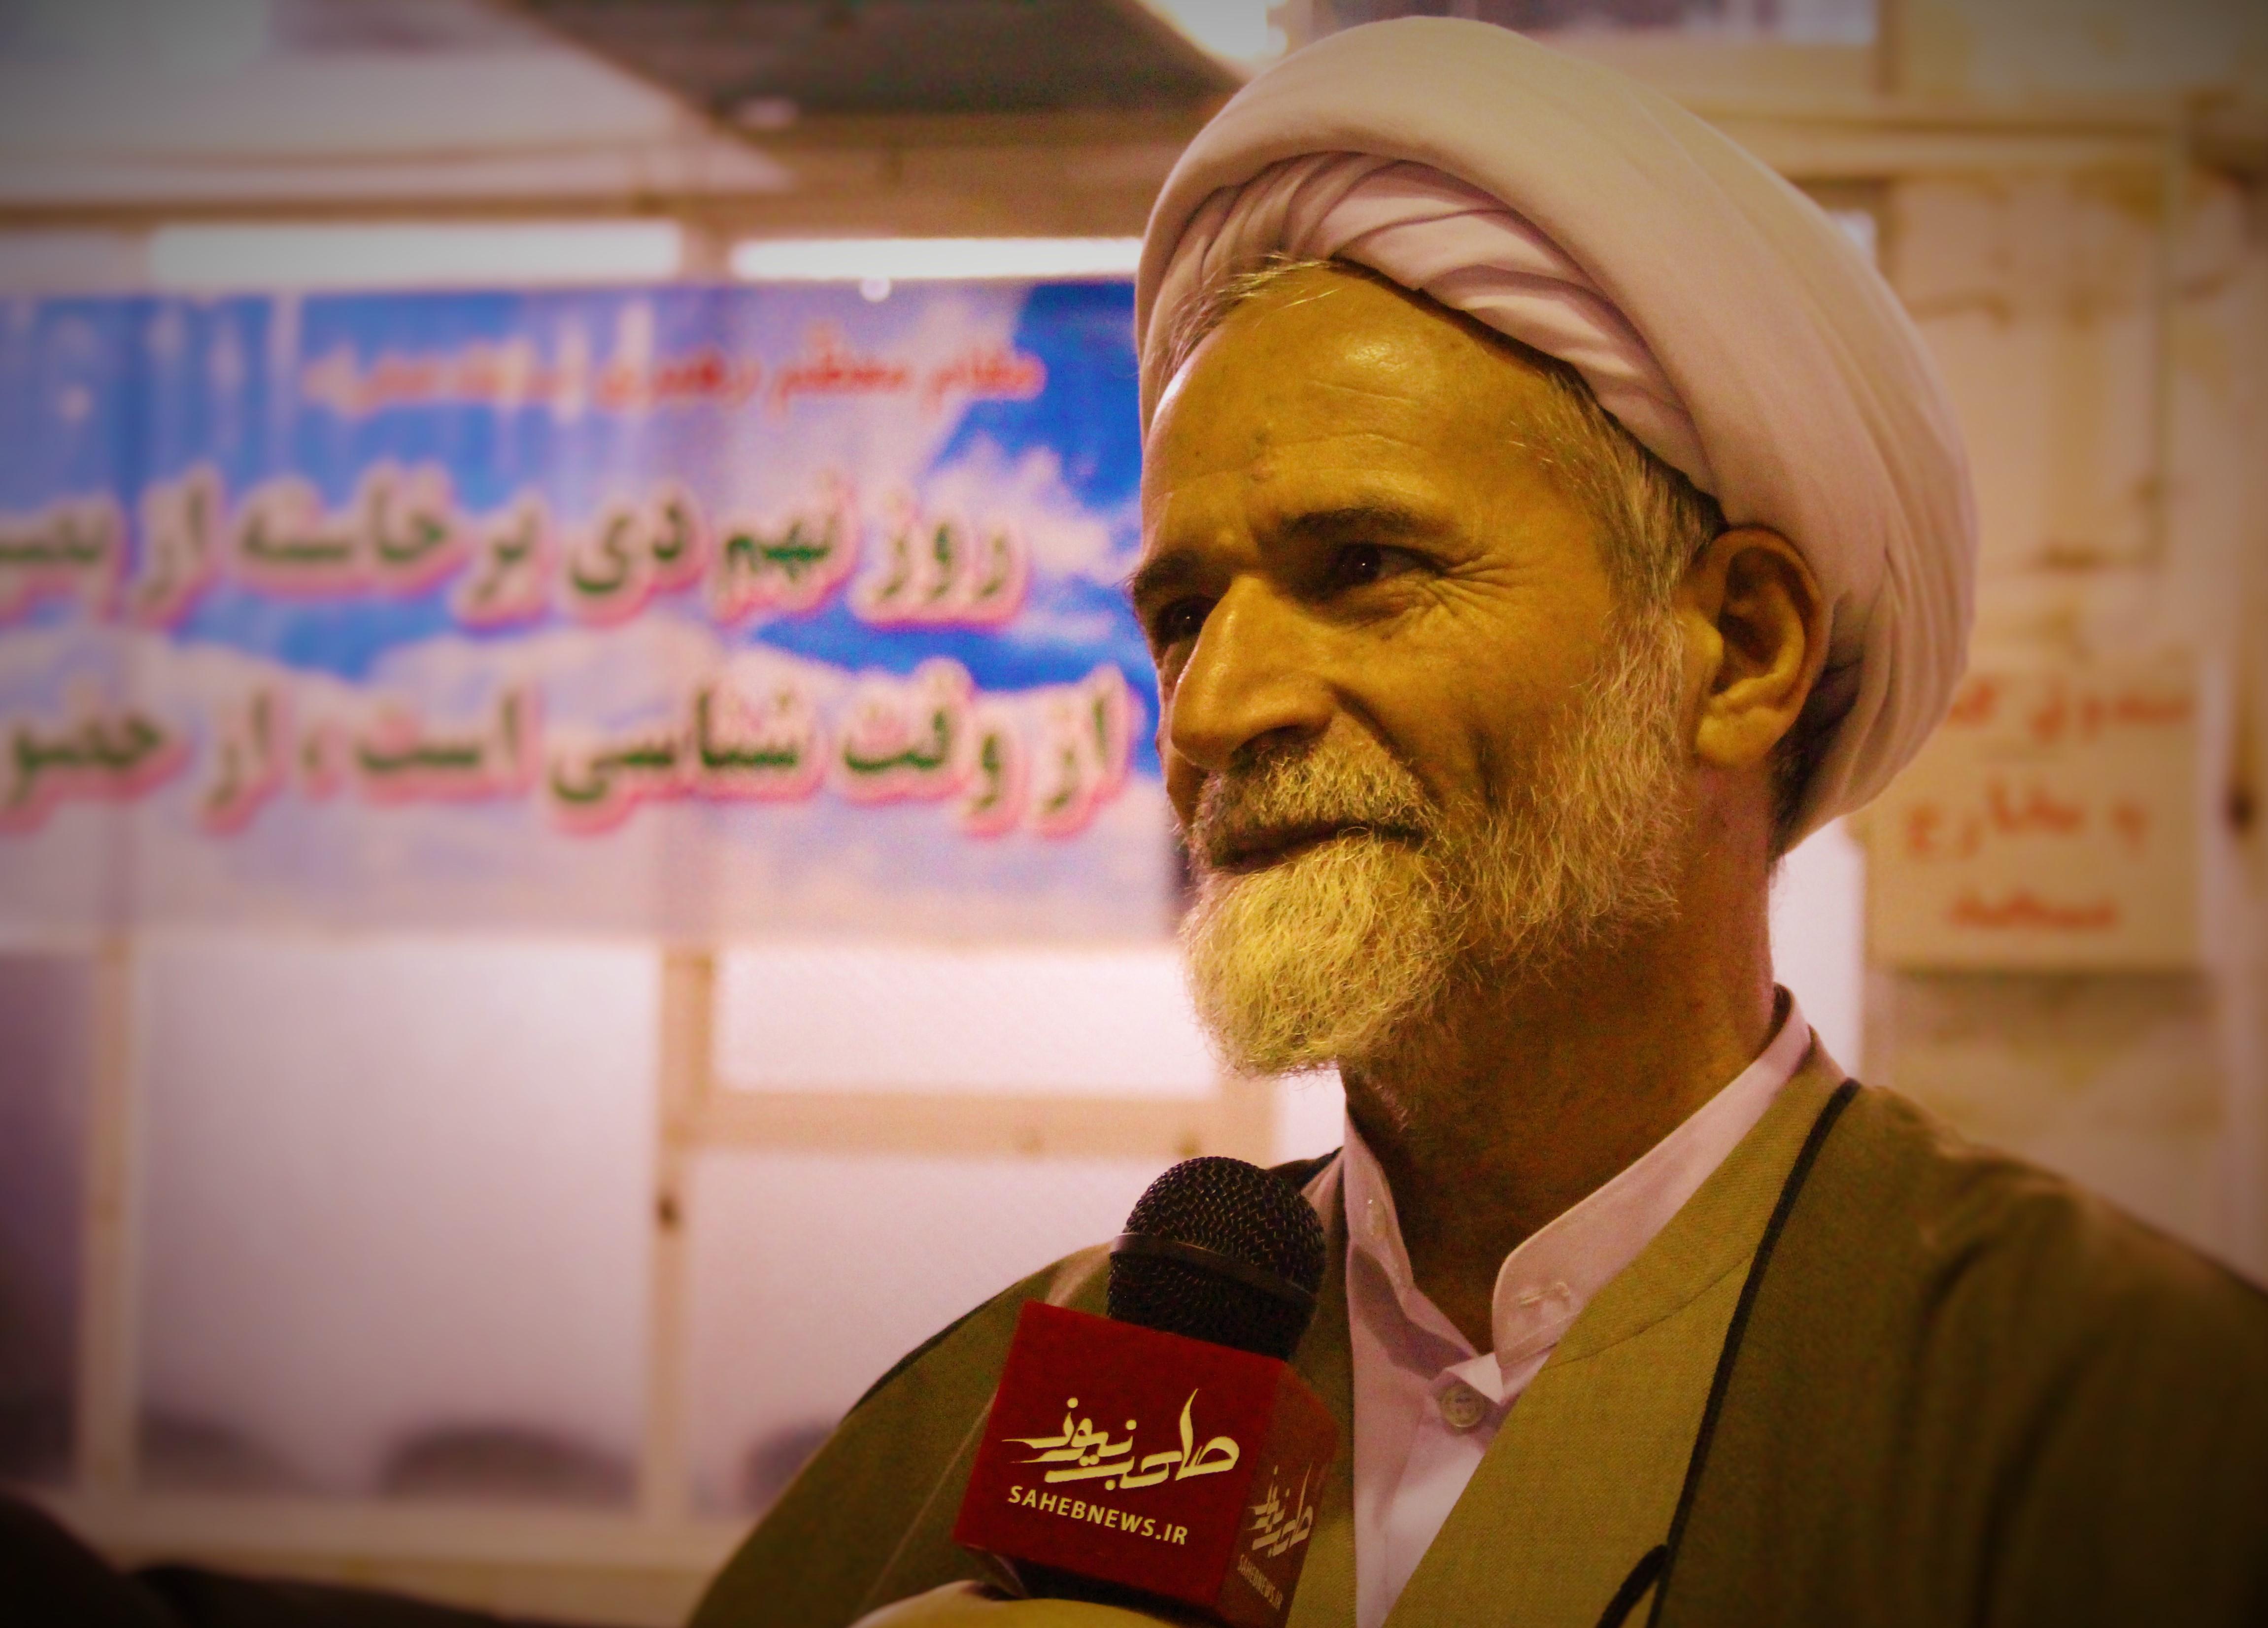 حجت الاسلام حسناتی